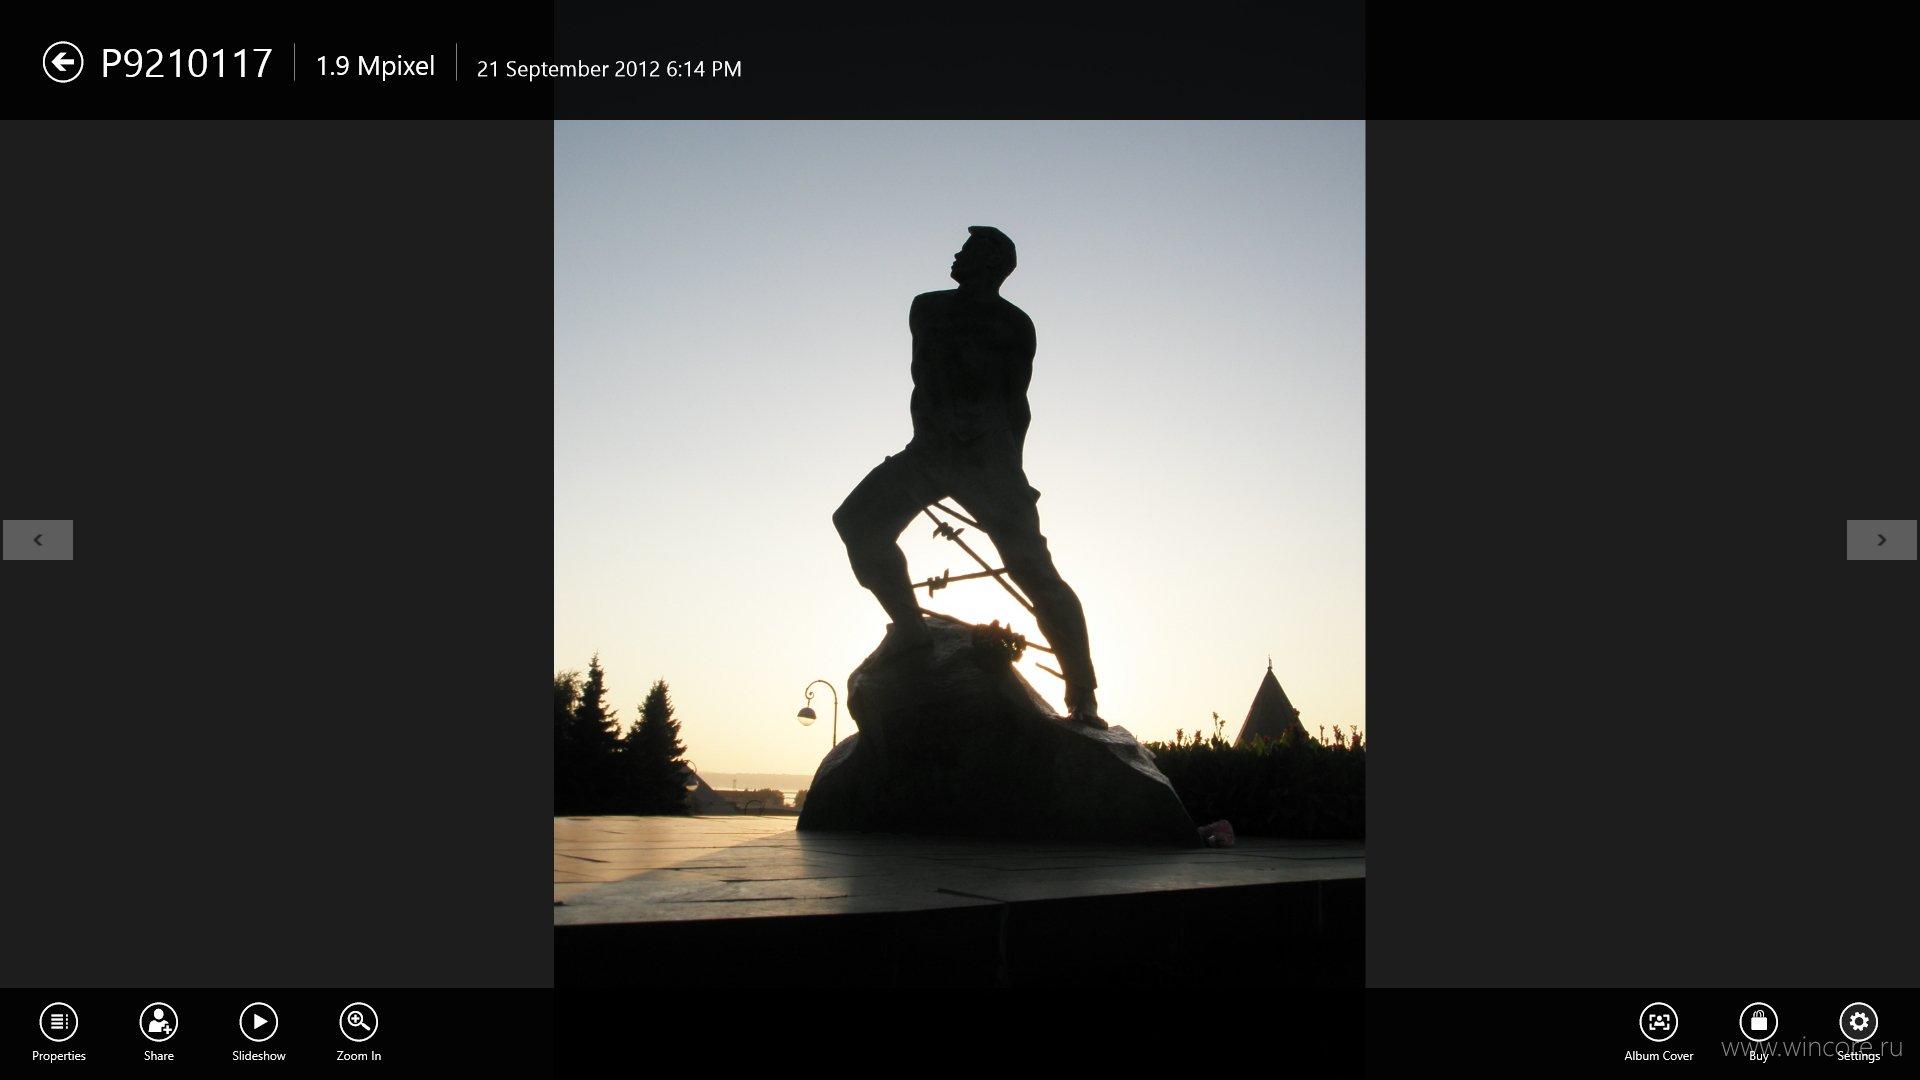 приложение для просмотра фотографий ...: www.wincore.ru/programs/525-gallery-hd-prilozhenie-dlya-prosmotra...